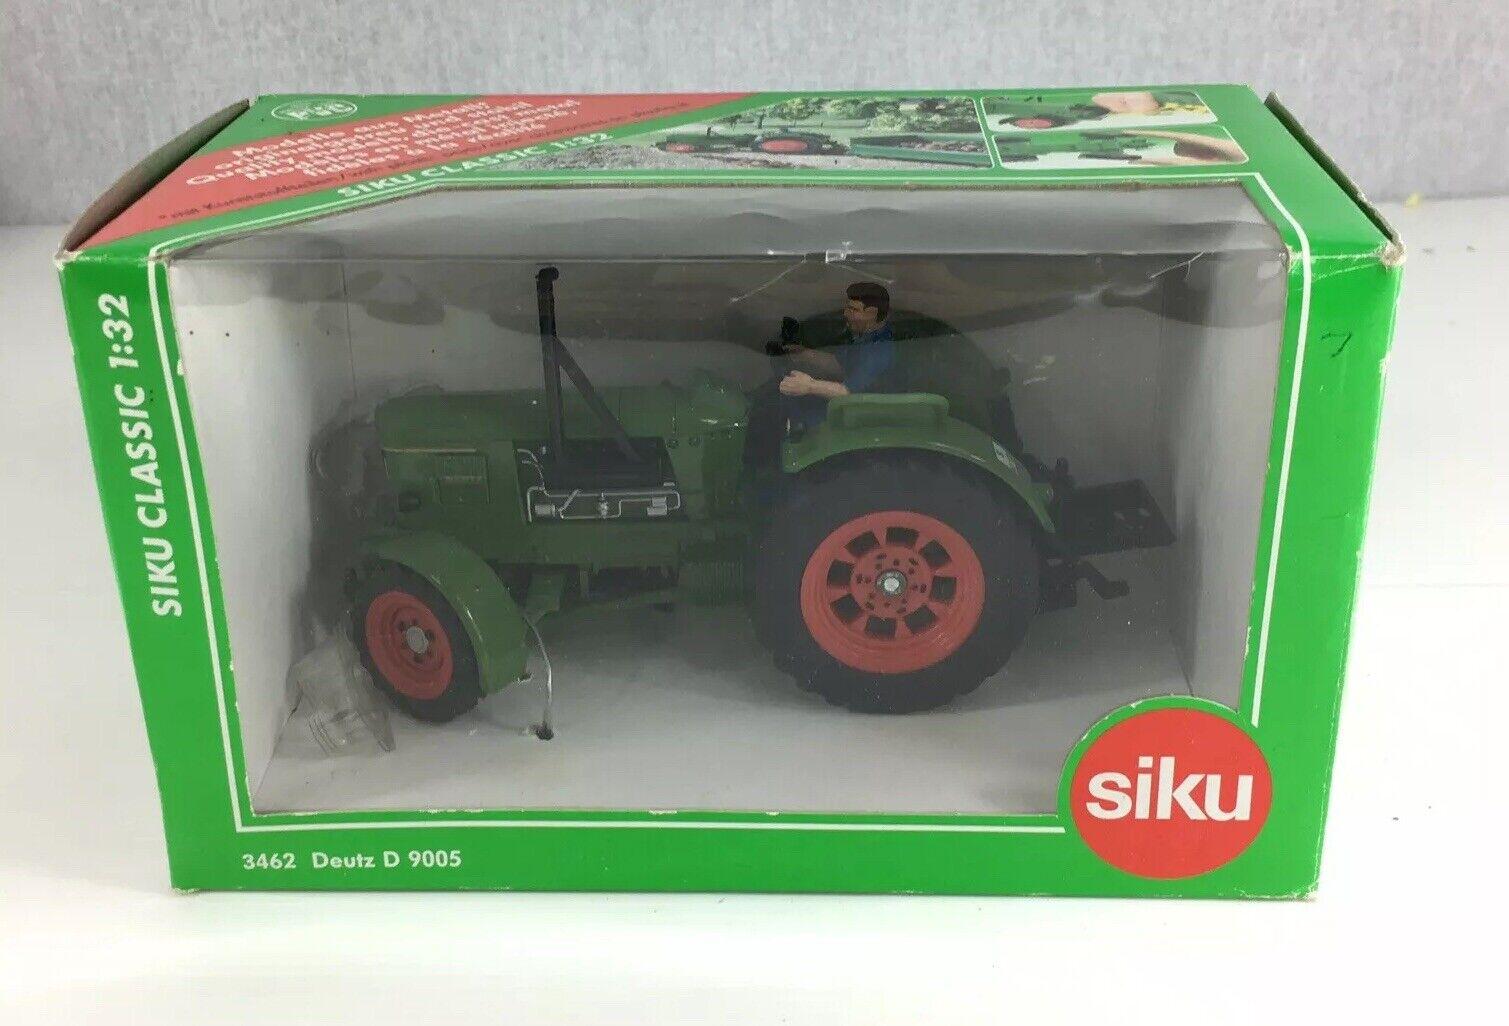 Siku Classic Deutz D 9005 No.3462 1 32 Scale Boxed